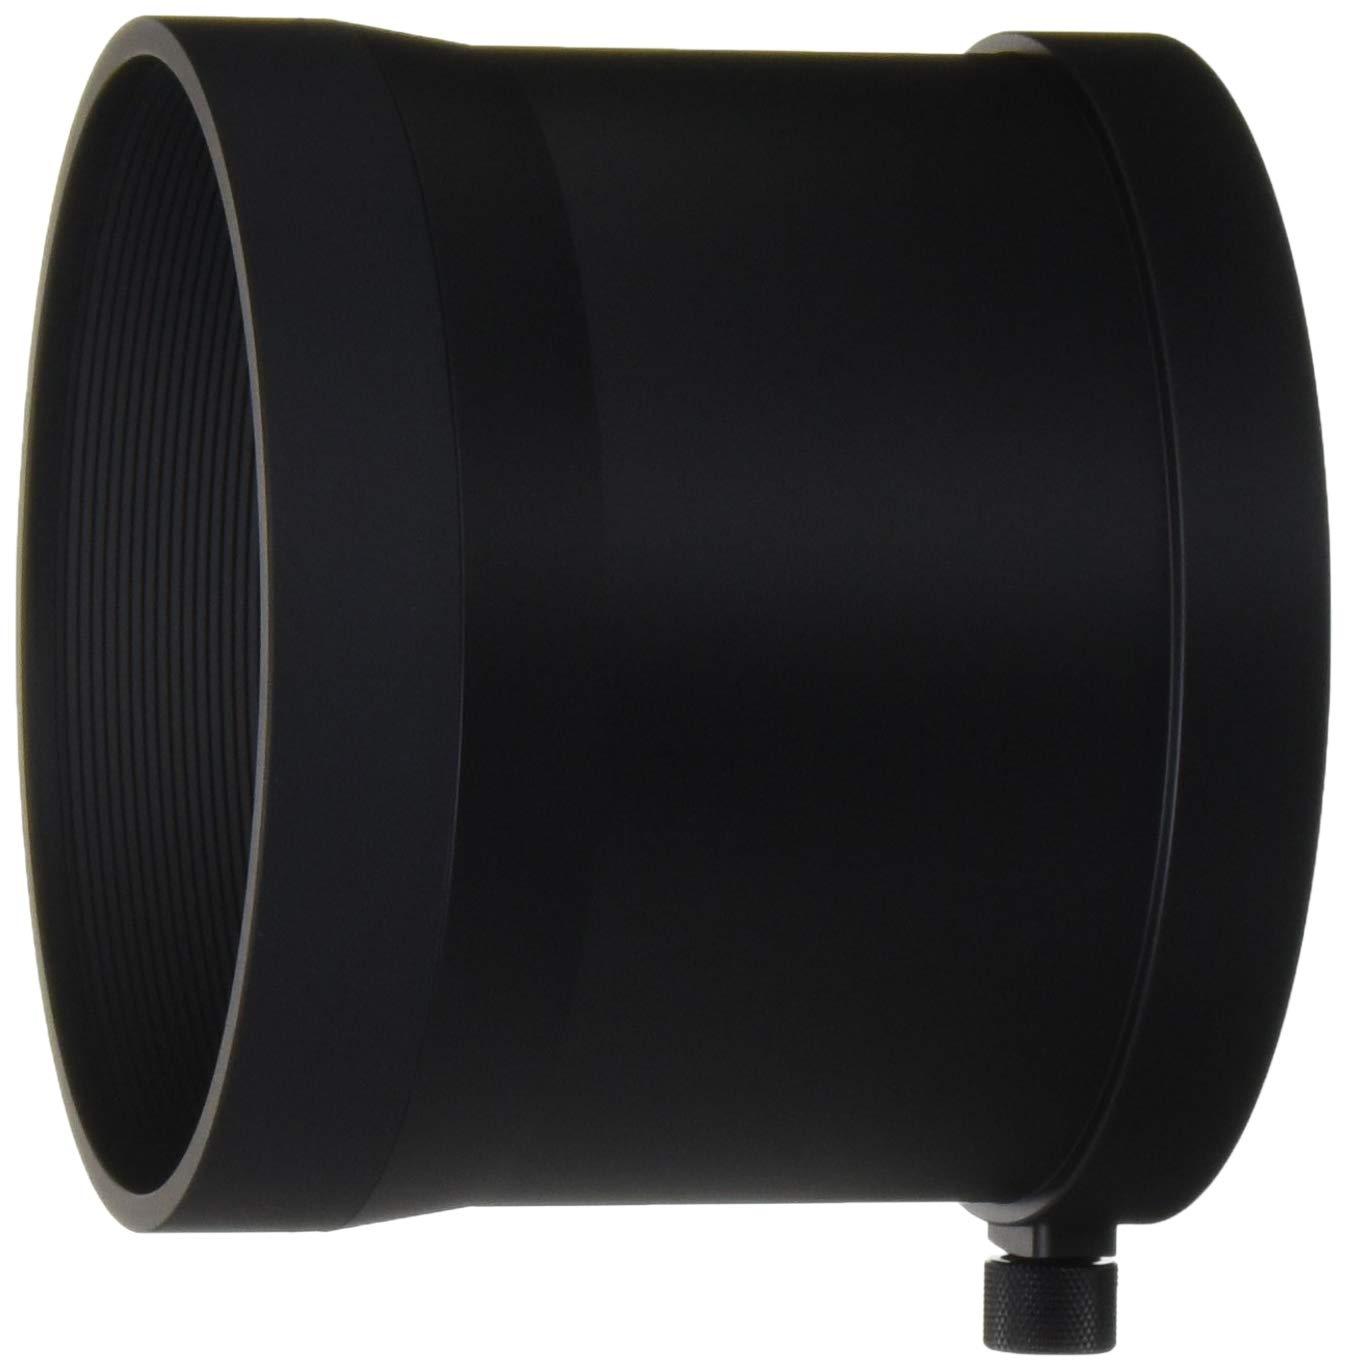 Sigma Hood for 150-600mm f/5-6.3 DG OS HSM Sports Lens